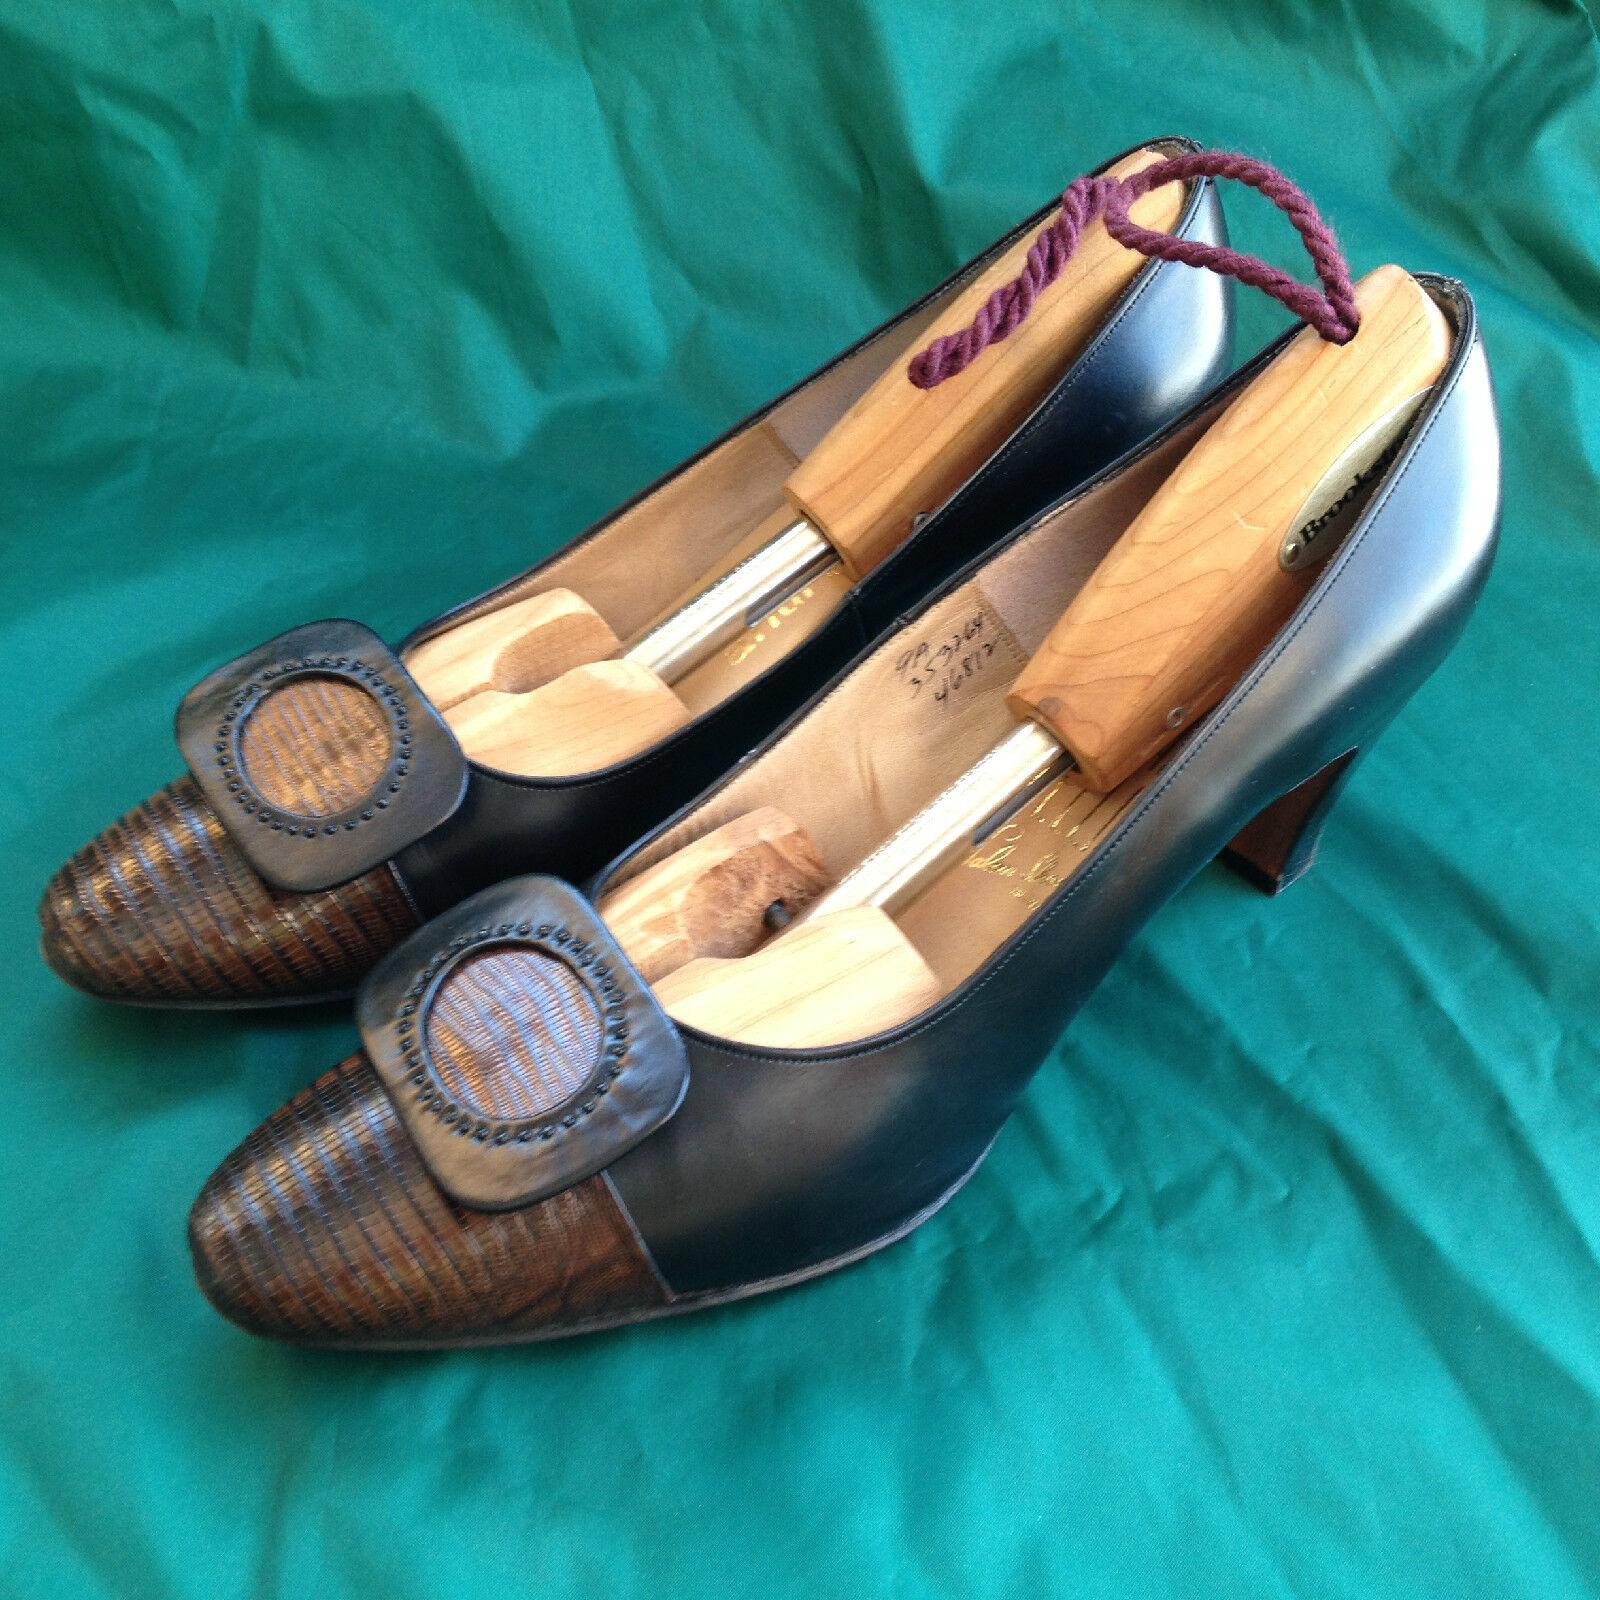 Vintage Andrew Geller Heels Packard Rellin Salon RARE Leather Snake shoes 9 A.